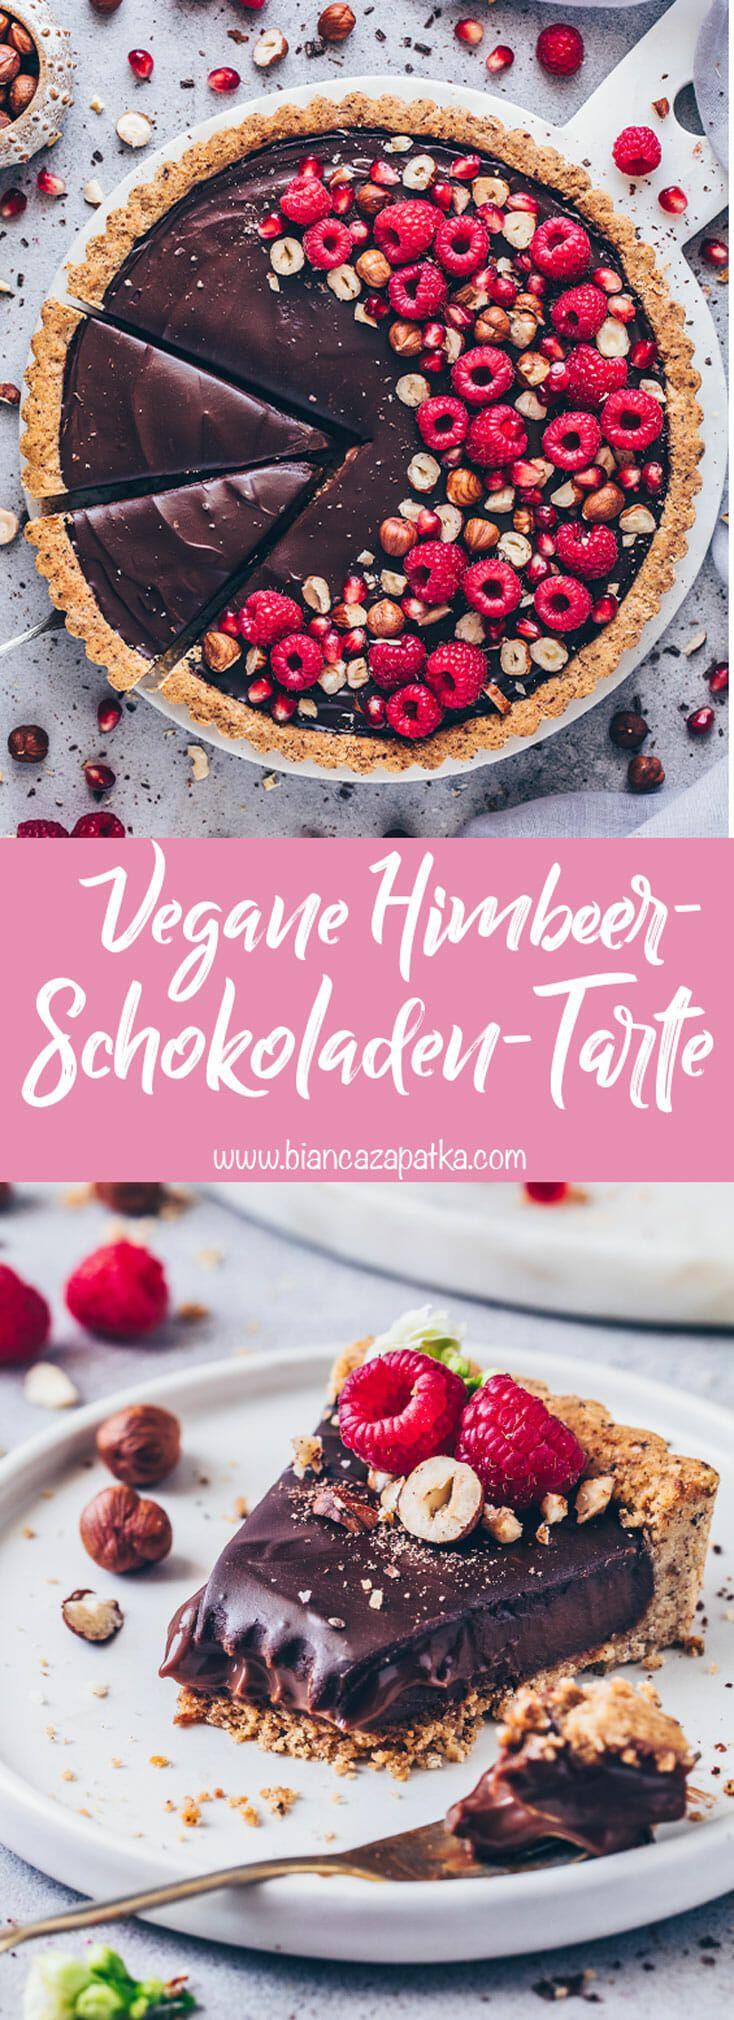 Himbeer Schokoladen Tarte mit Haselnüssen (vegan) - Bianca Zapatka | Rezepte